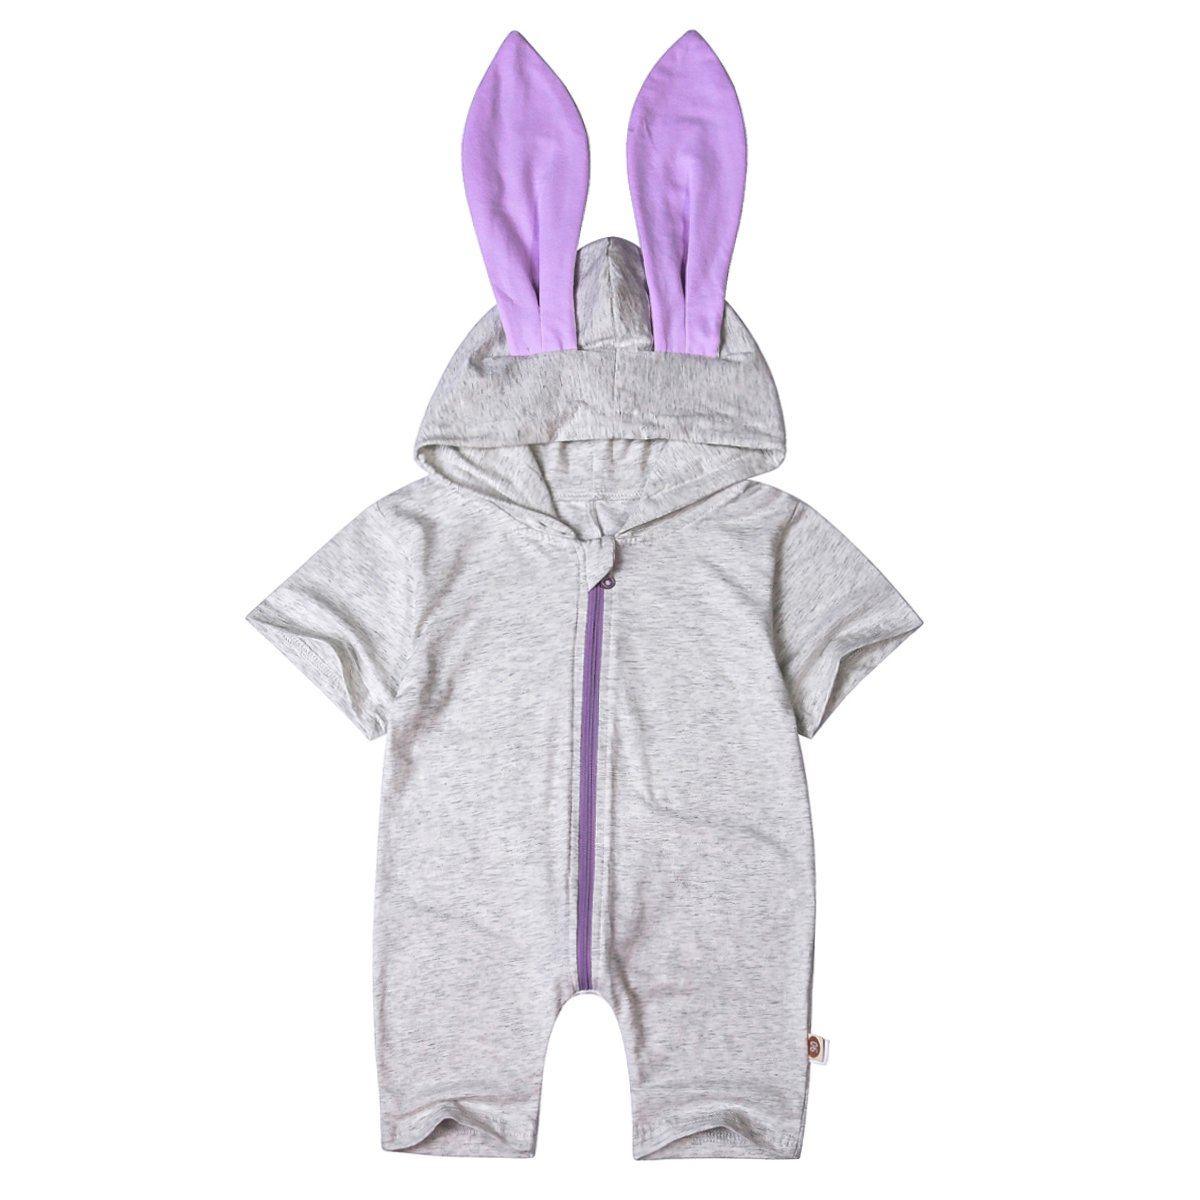 Minilove Baby Boys Girls Dinosaur Rabbit Hoodie Romper